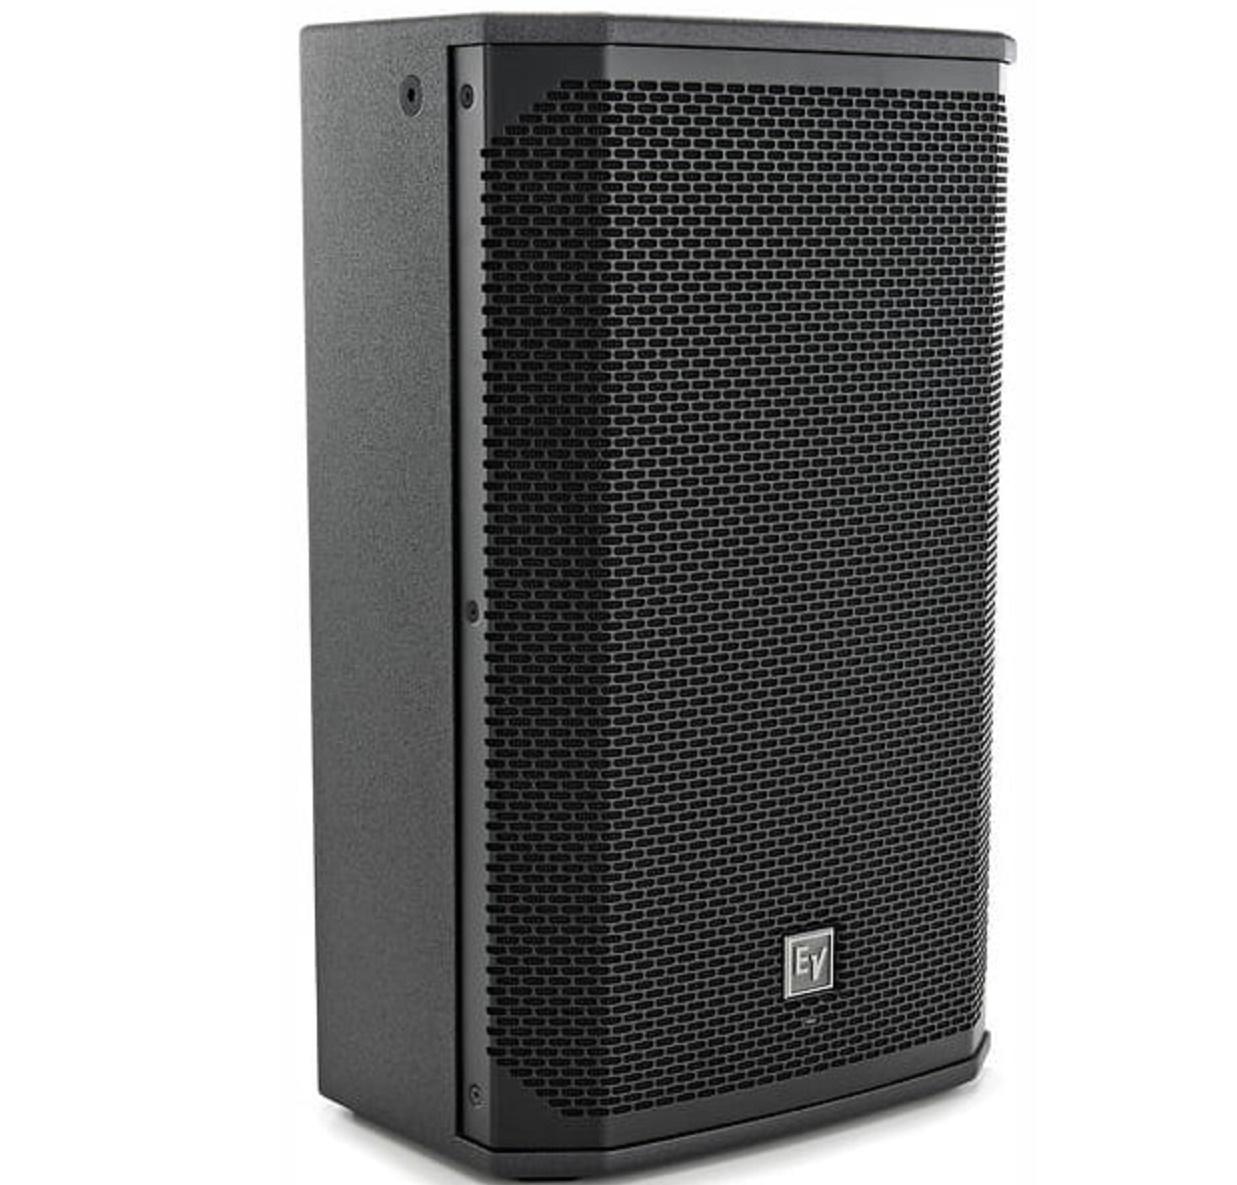 Electro Voice Ekx 12P Caja Acústica Amplificada